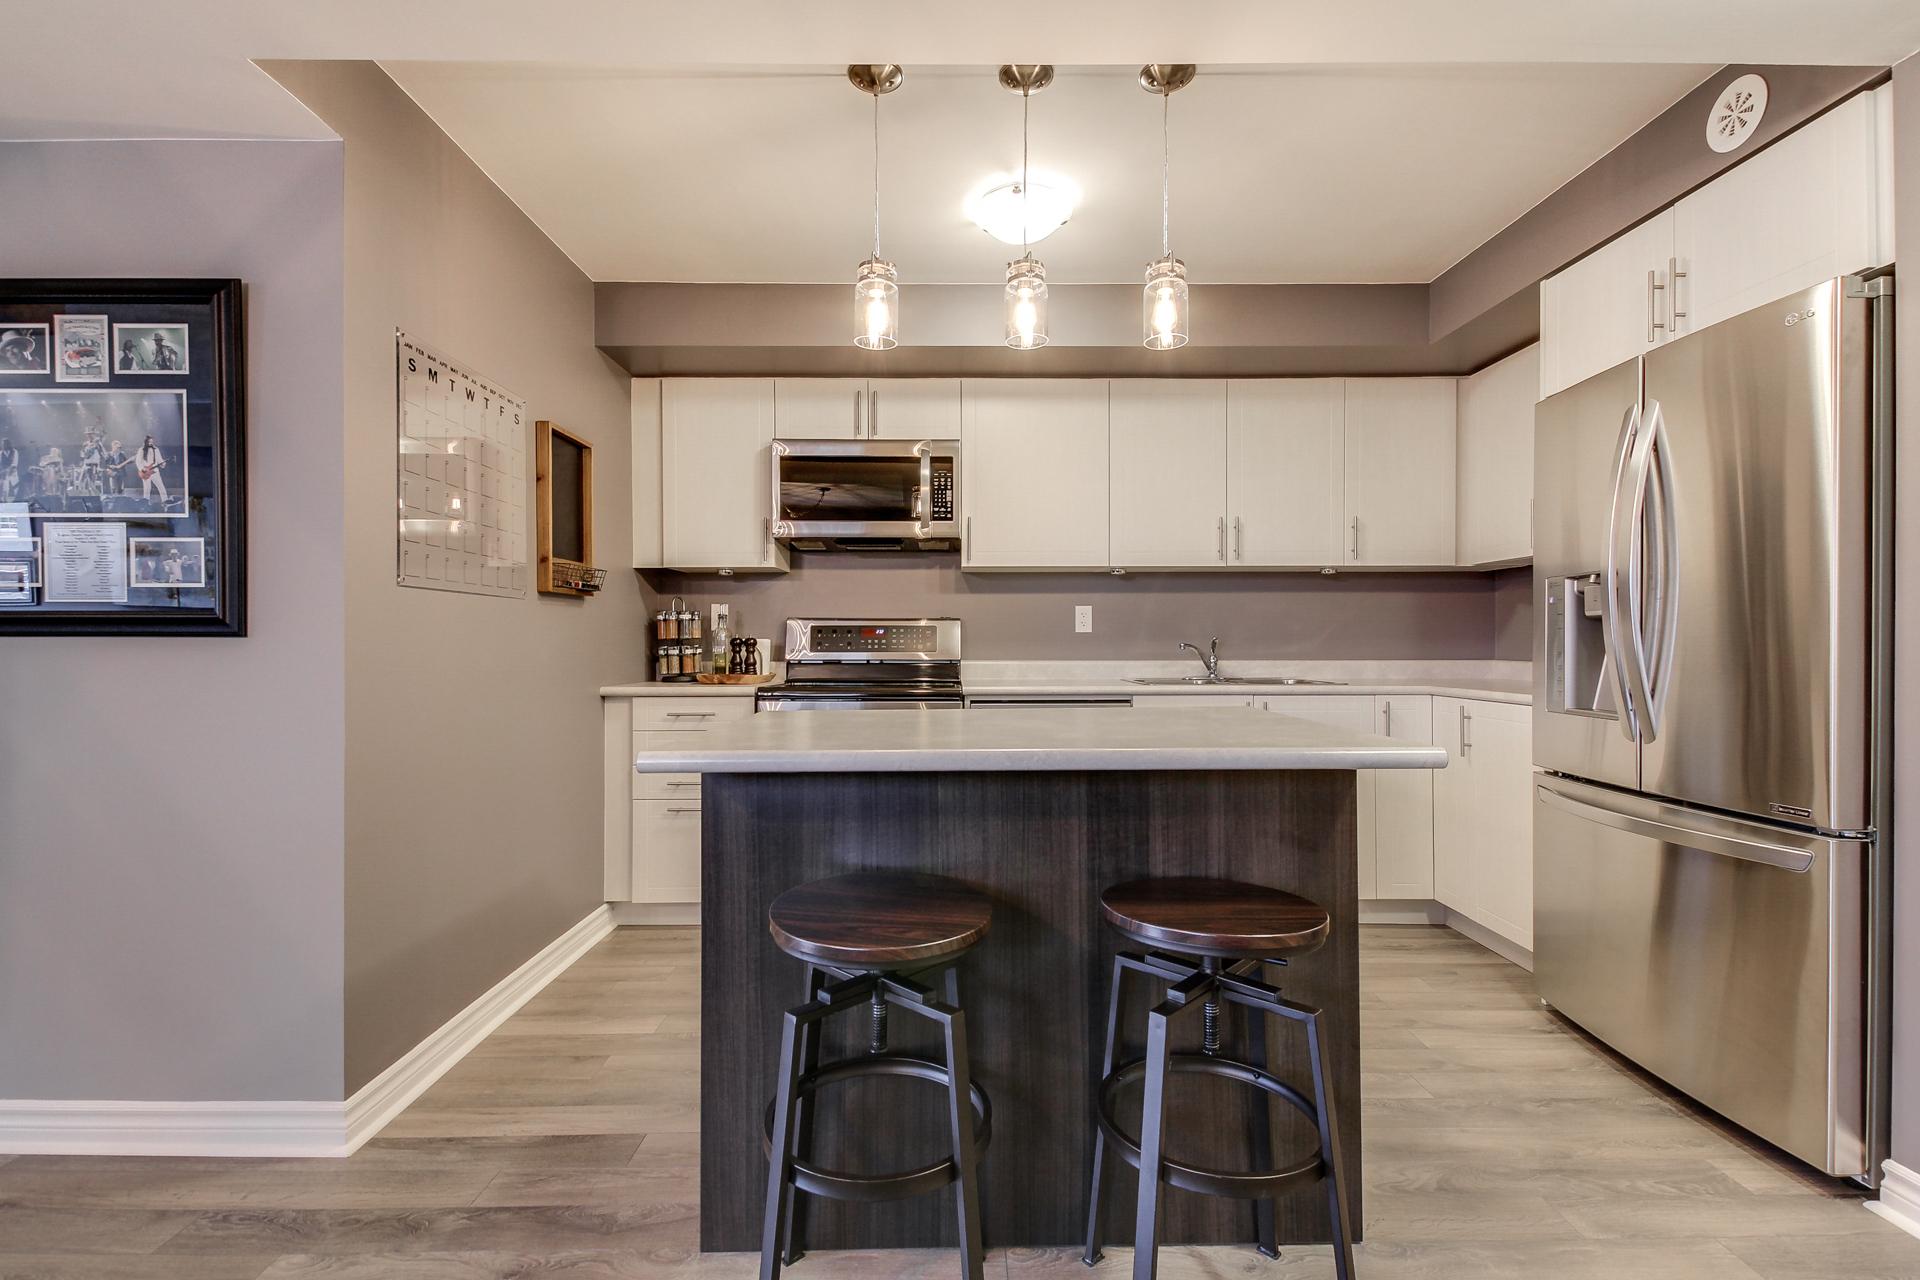 2420-Baronwood-Drive-2201-Oakville-For-Sale-Karly-Moore (11).jpg